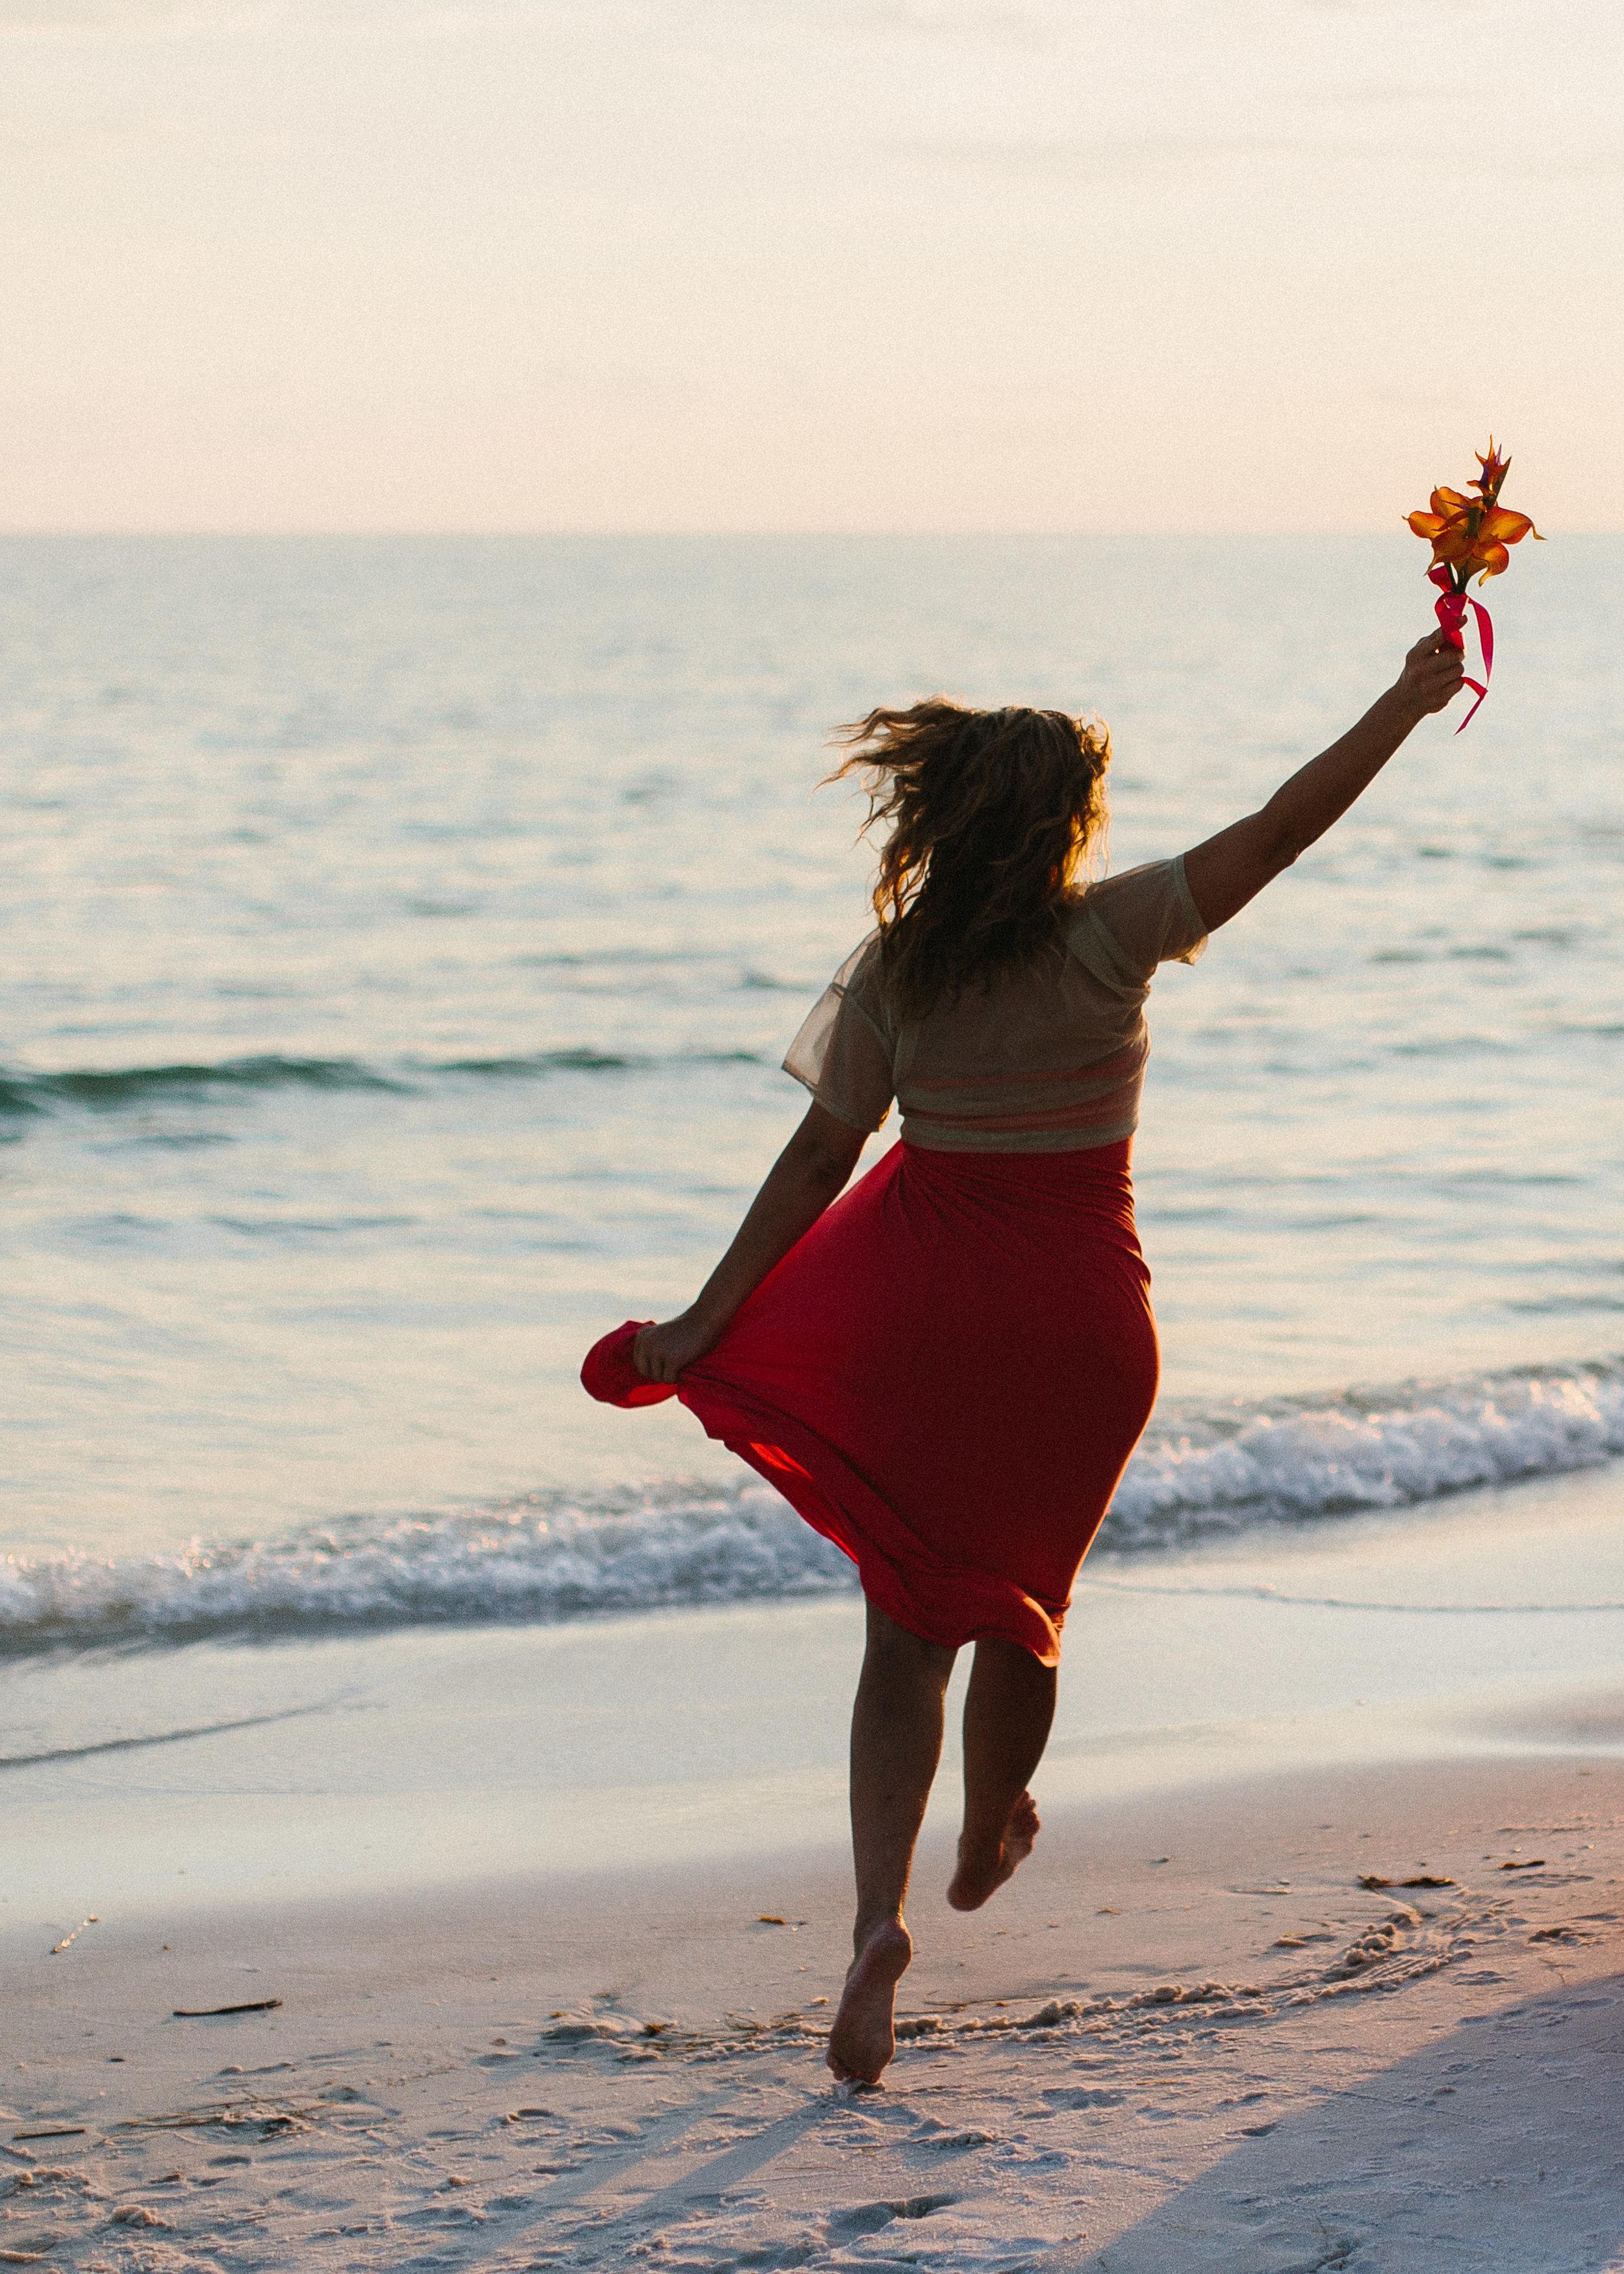 destin_sunset_beach_elopement_intimate_wedding_photographer_florida_documentary_1293.jpg